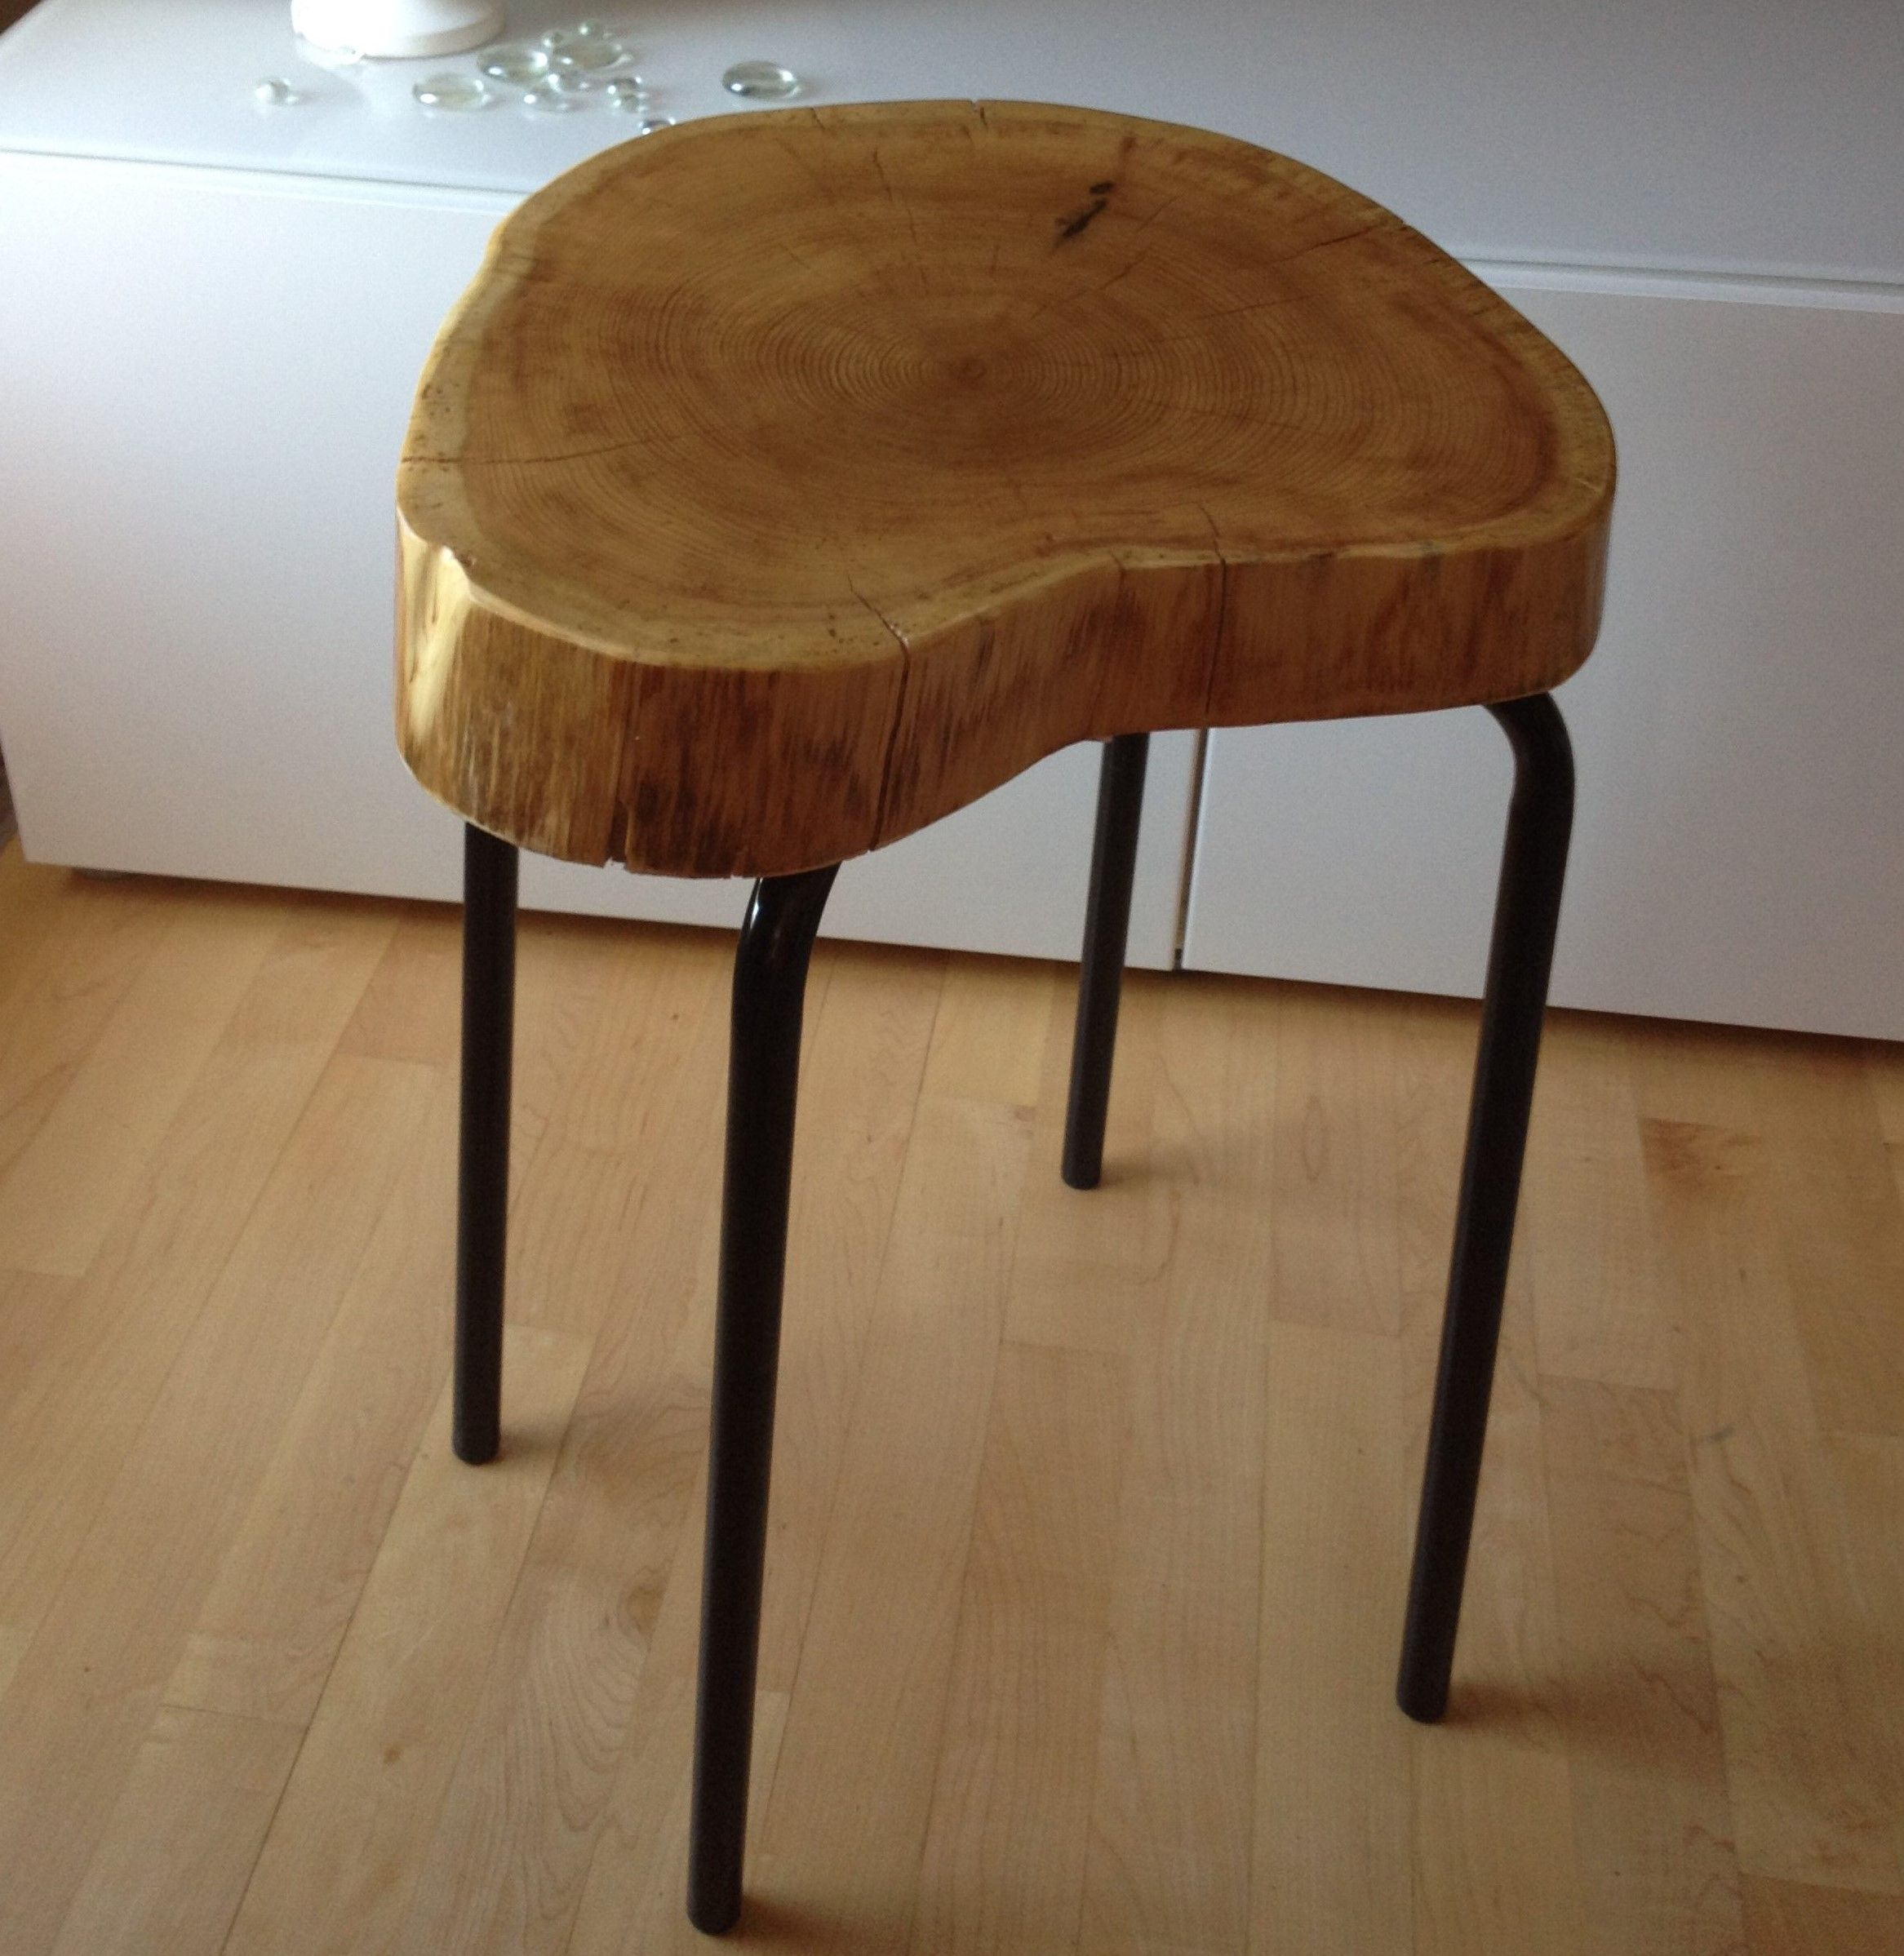 Stump End Table   Cedar Wood Stump Table With Metal Legs.  Www.serenitystumps.